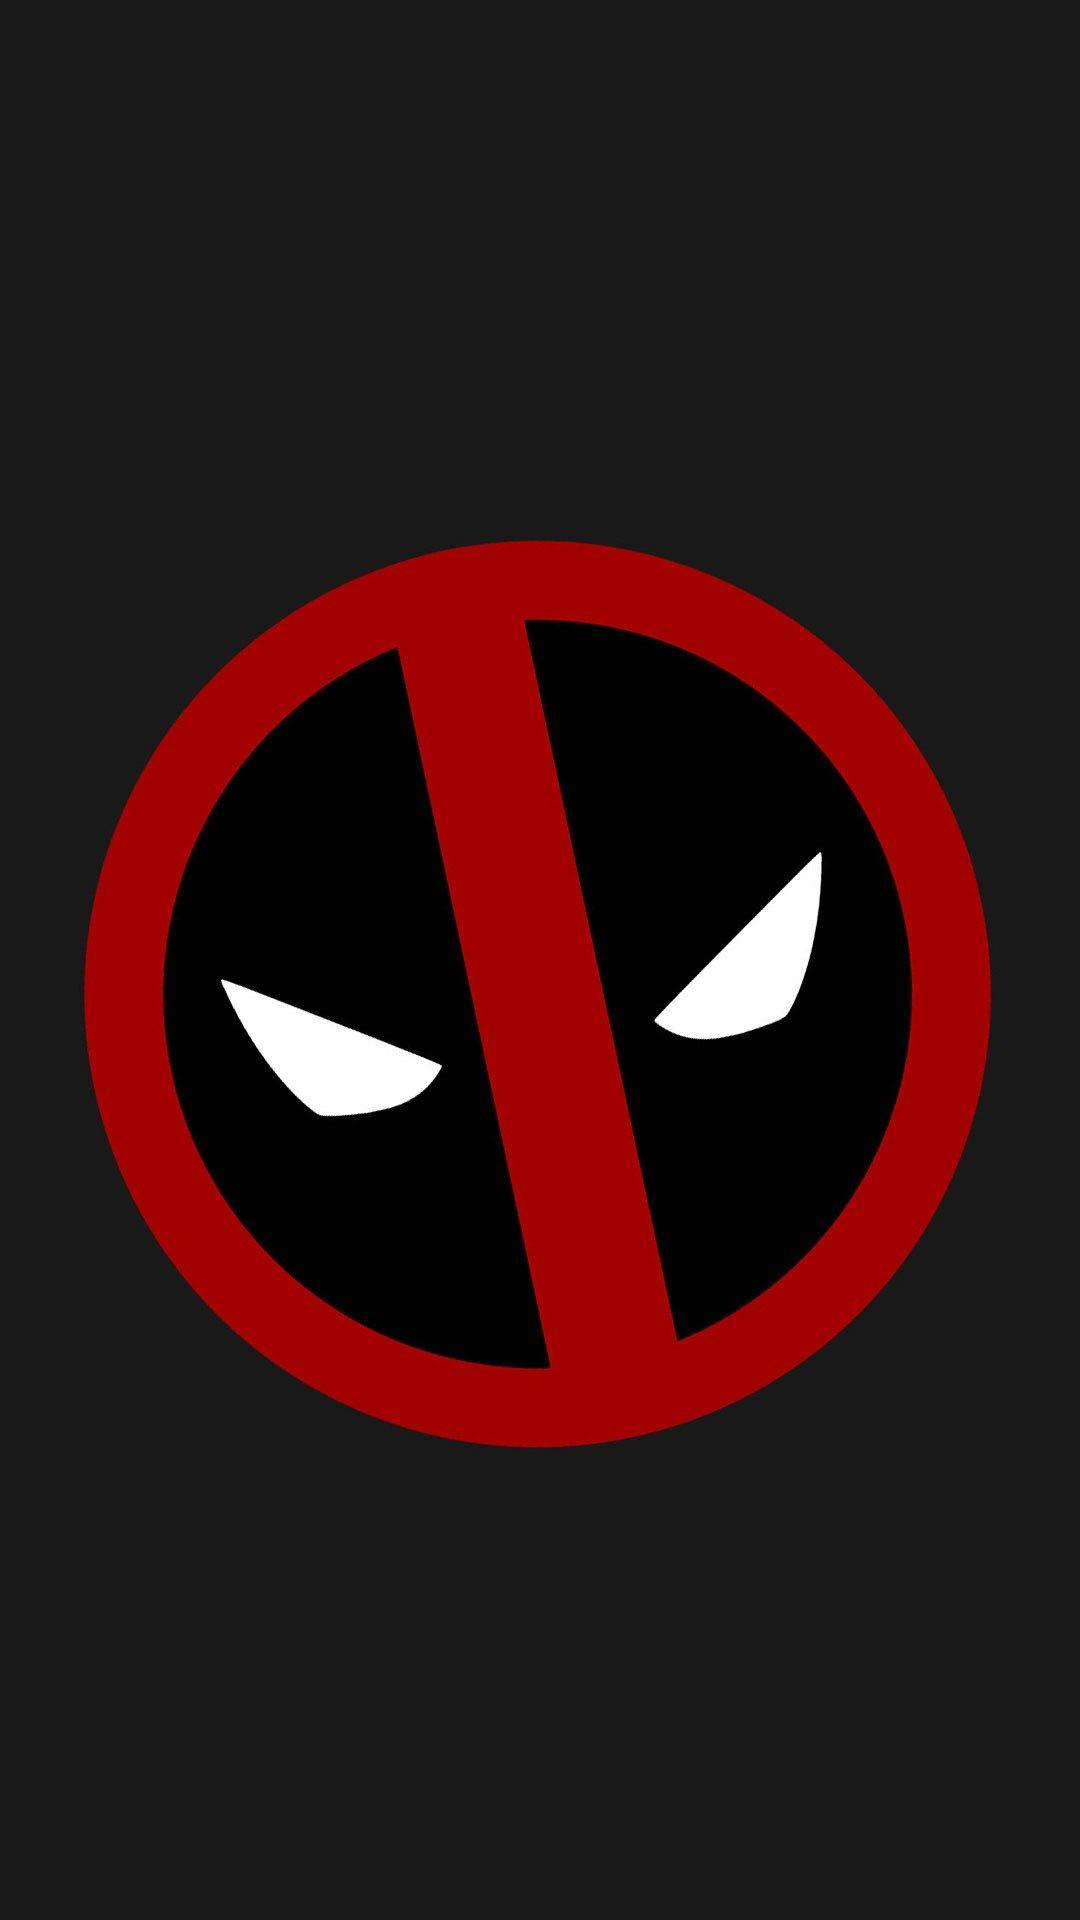 Deadpool Logo Wallpaper Android 1080x1920